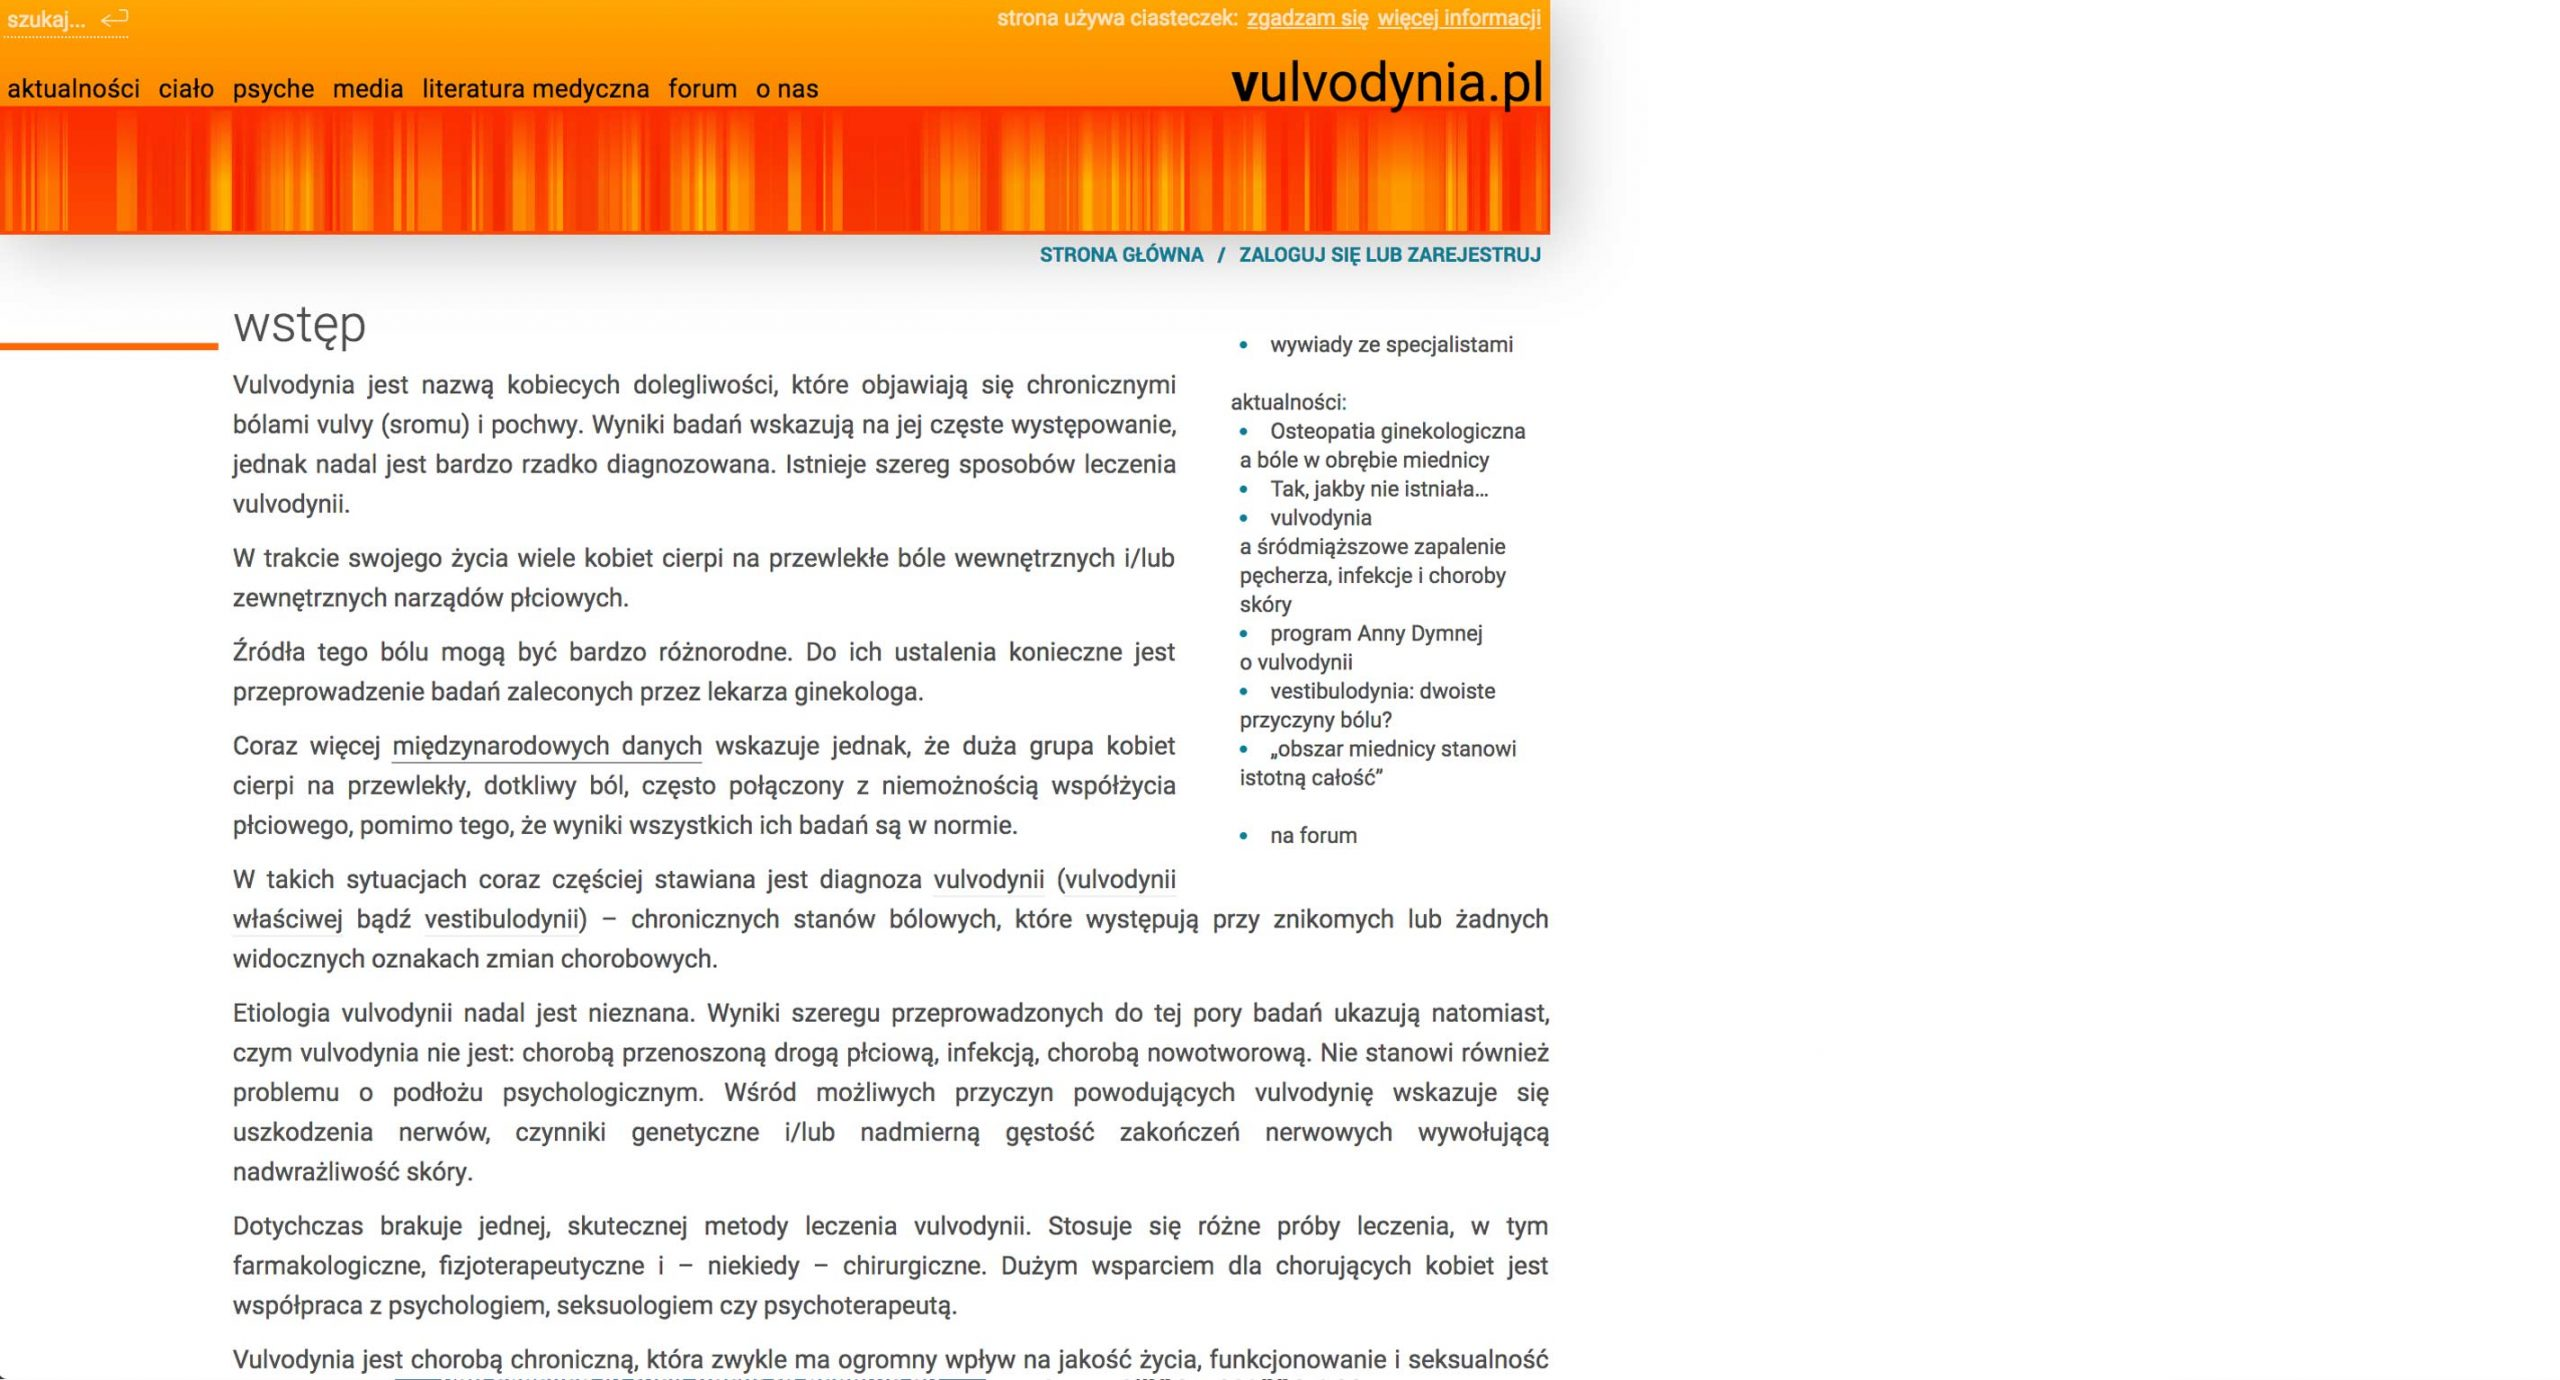 vulvodynia.pl - Home Page